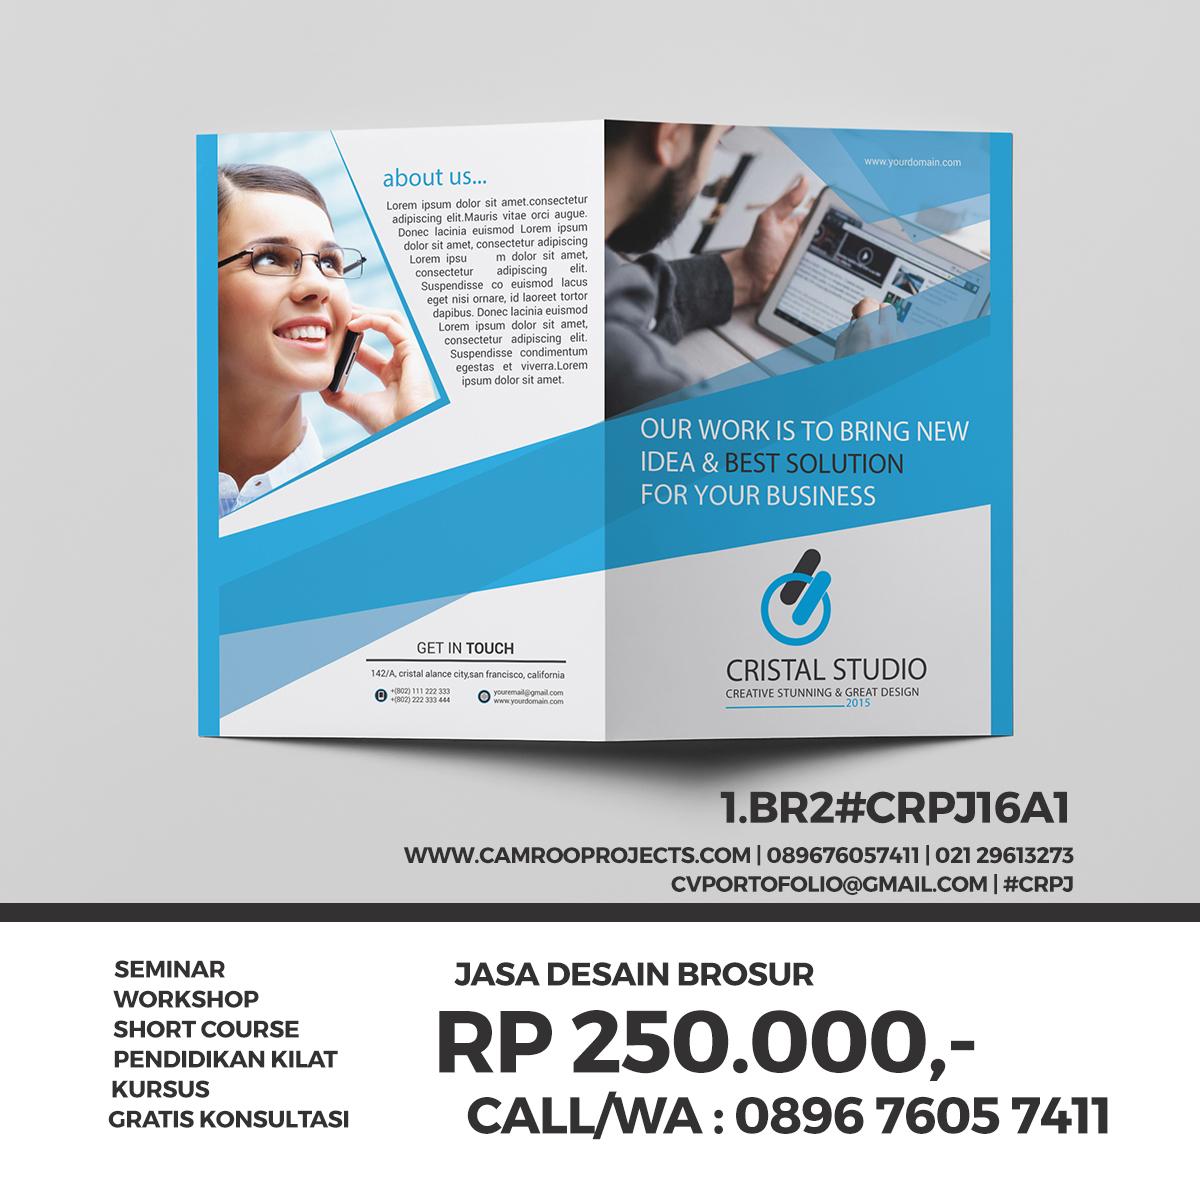 Jasa Desain Flyer | Terunik | Call/WA 0896 760 574 11